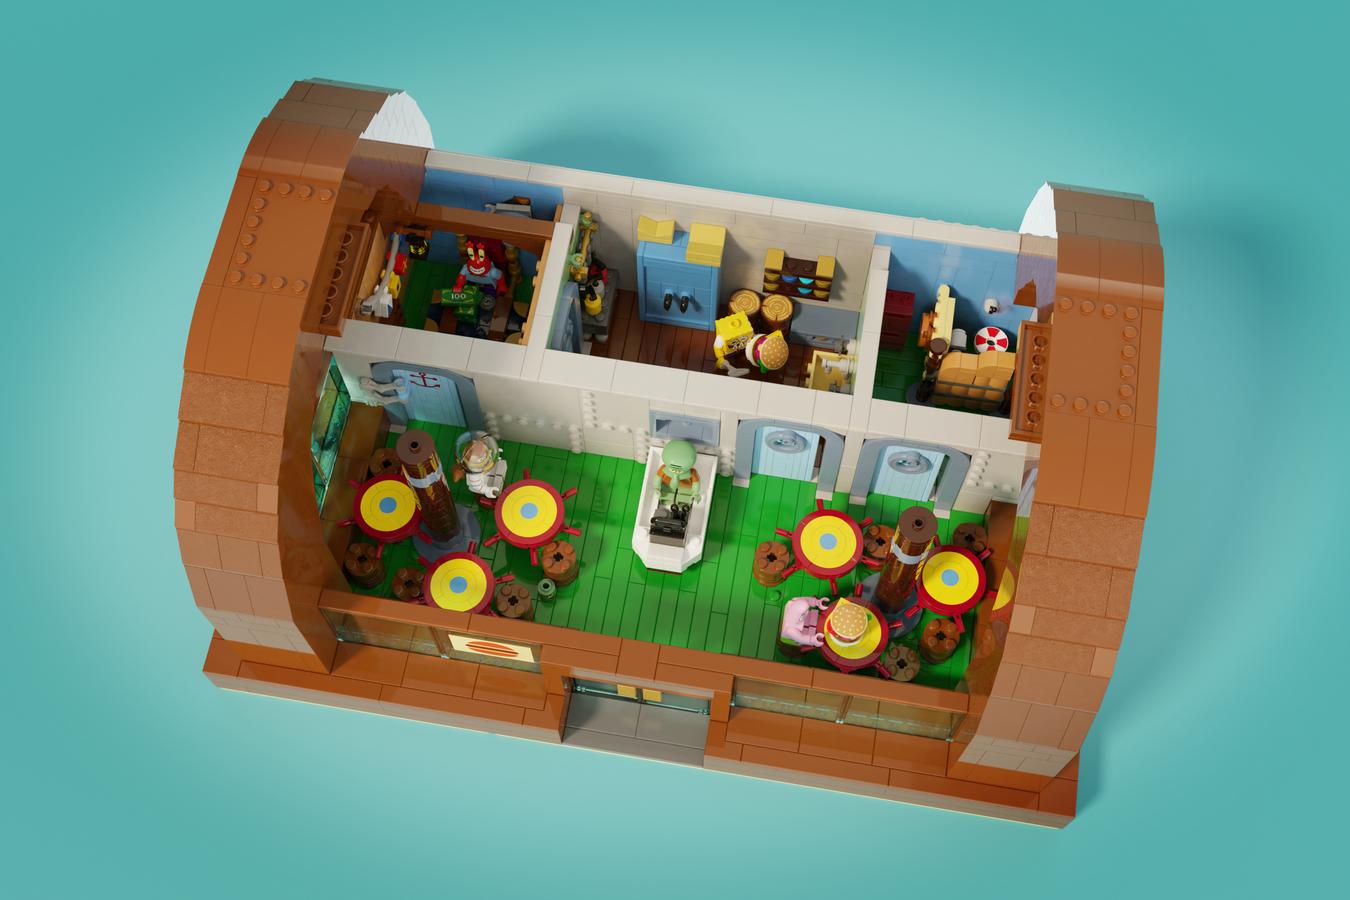 lego-ideas-spongebob-squarepants-the-krusty-krab-exe-sandbox-3 zusammengebaut.com